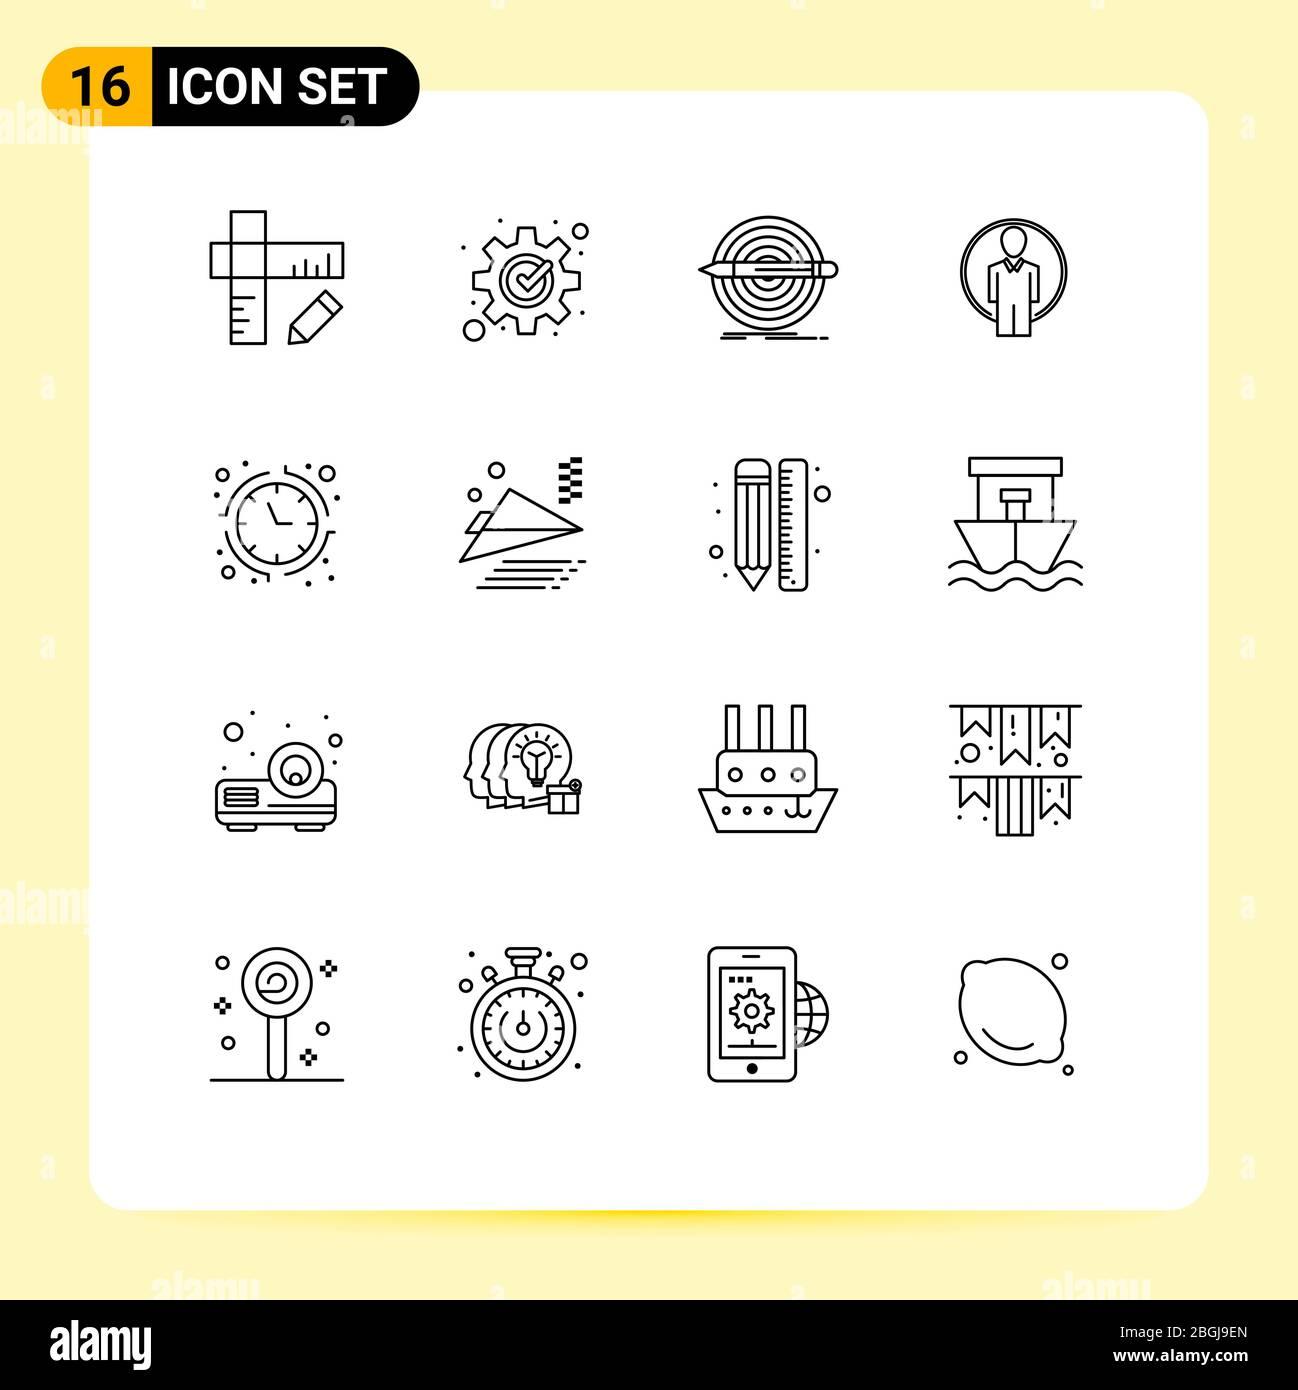 User Interface Pack Of 16 Basic Outlines Of Economy Image Goal Login User Editable Vector Design Elements Stock Vector Image Art Alamy